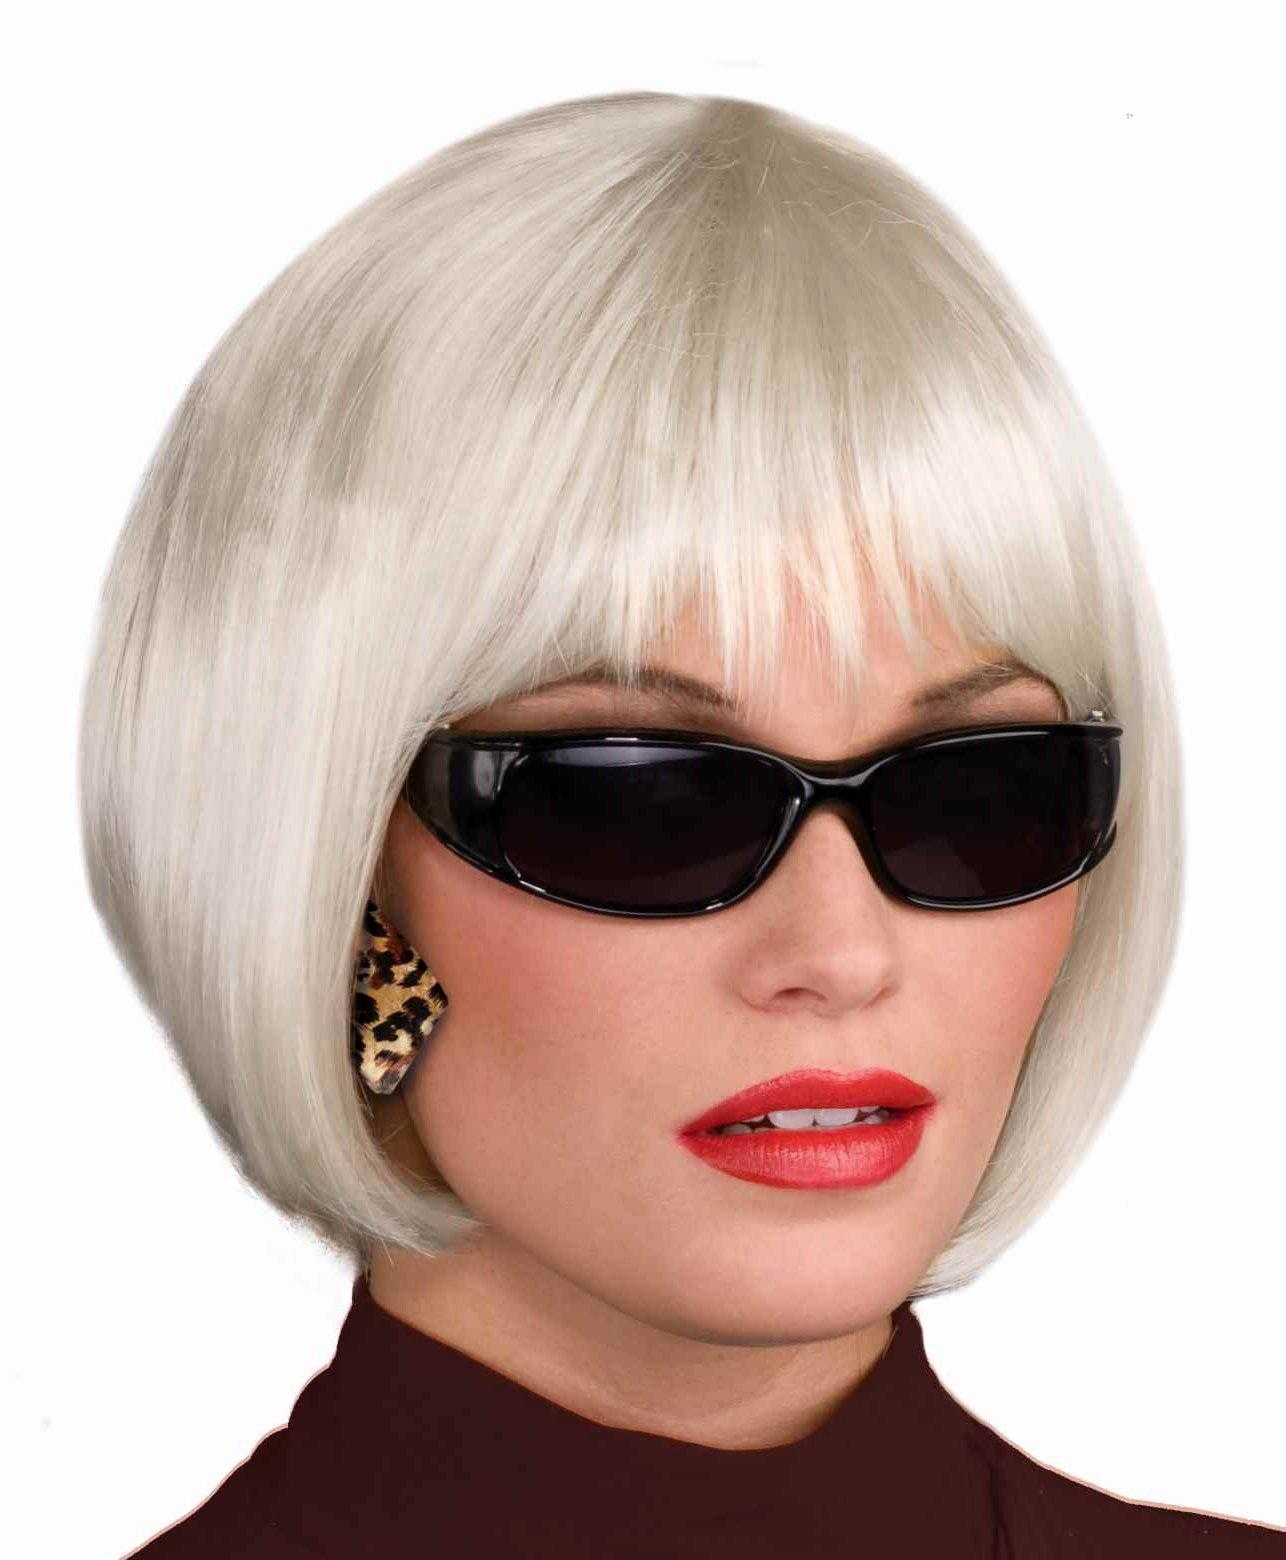 Forum Novelties Women's Chic Bob Wig, Platinum, Standard Size by Forum Novelties (Image #1)